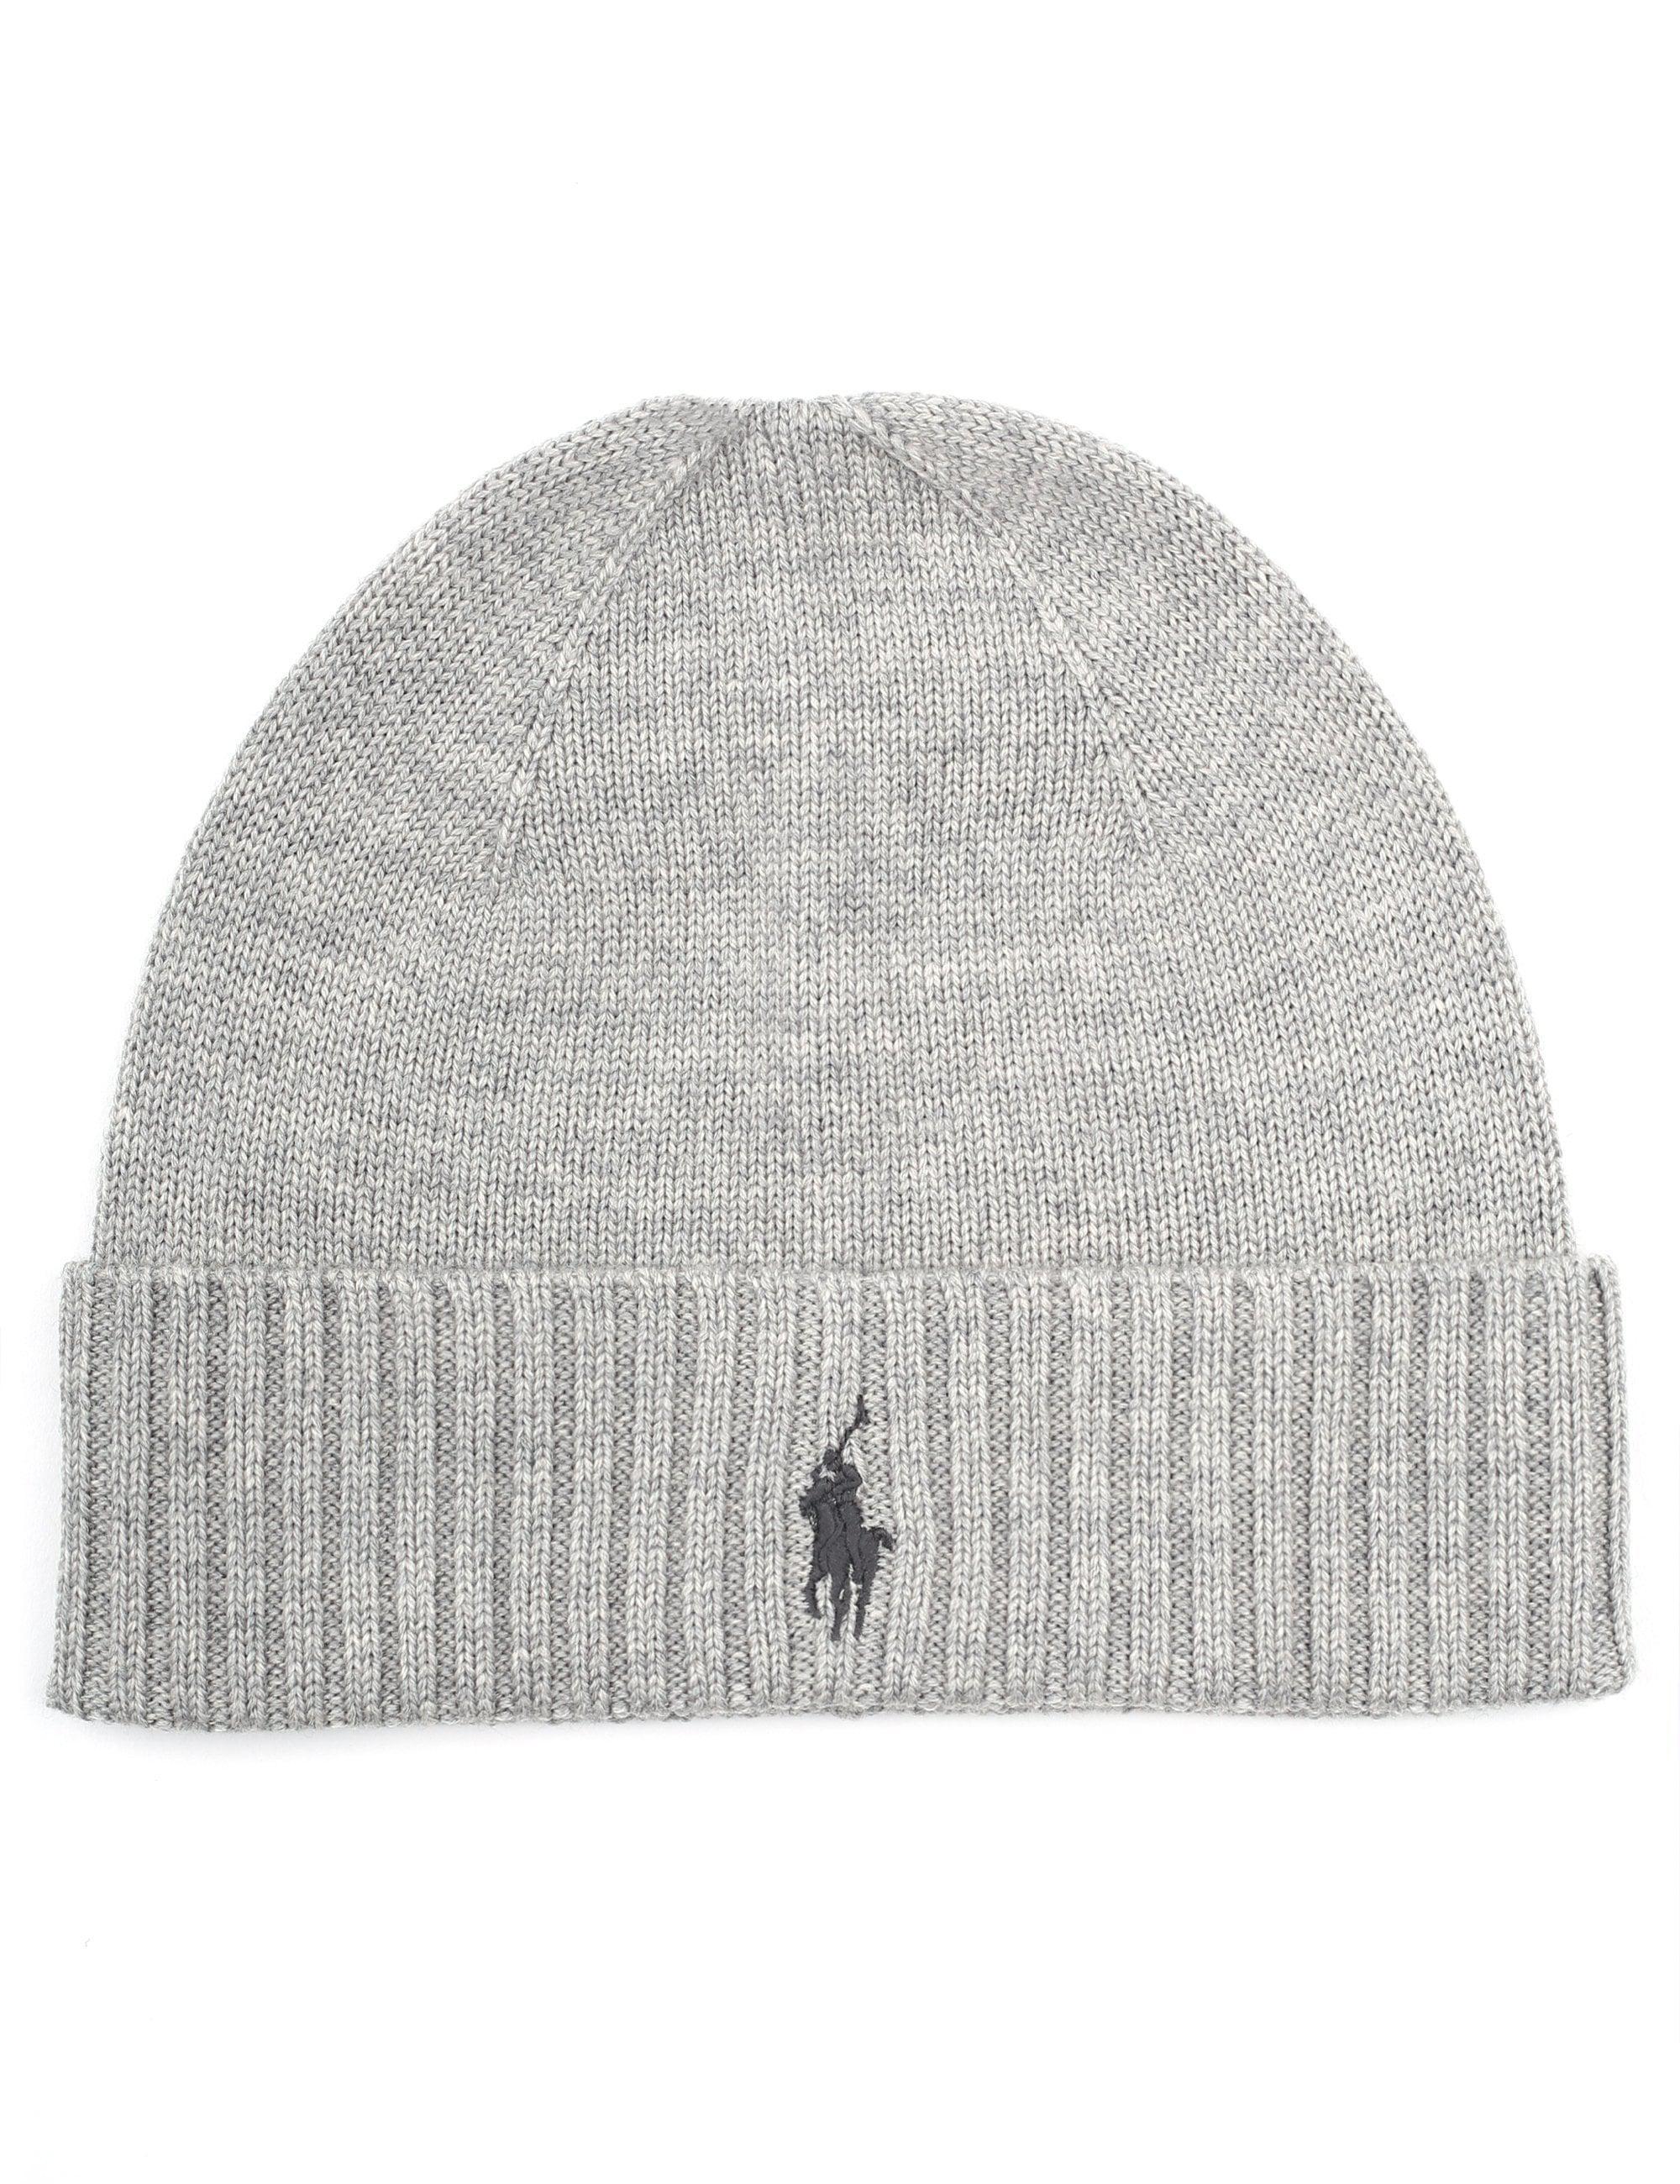 7d604bd867c Polo Ralph Lauren Men s Fo Beanie Hat Grey in Gray for Men - Lyst